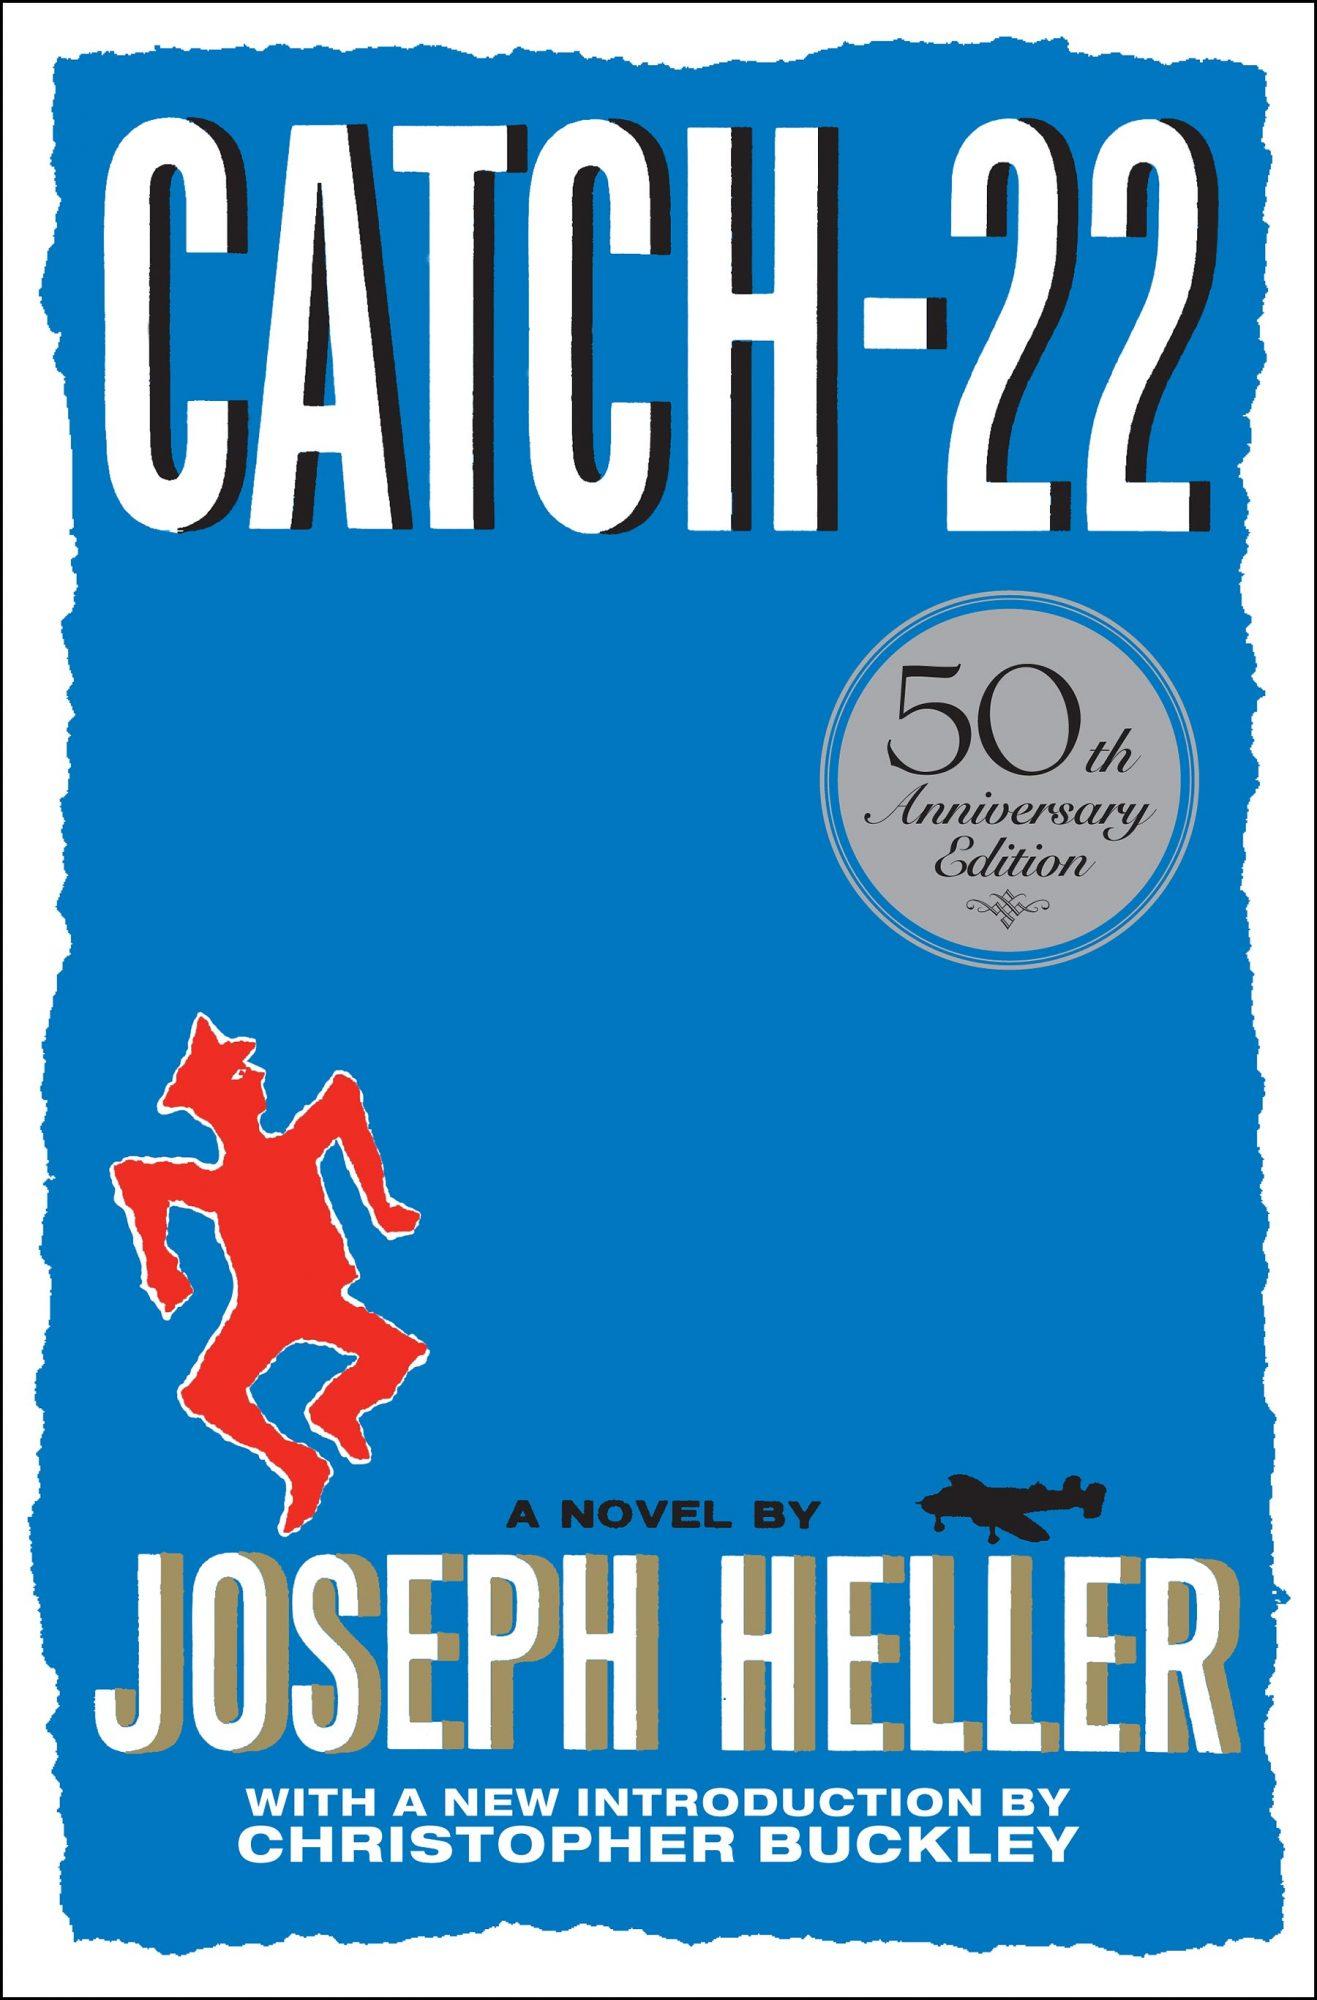 Catch-2250th Anniversary EditionBy Joseph Heller CR: Simon & Schuster